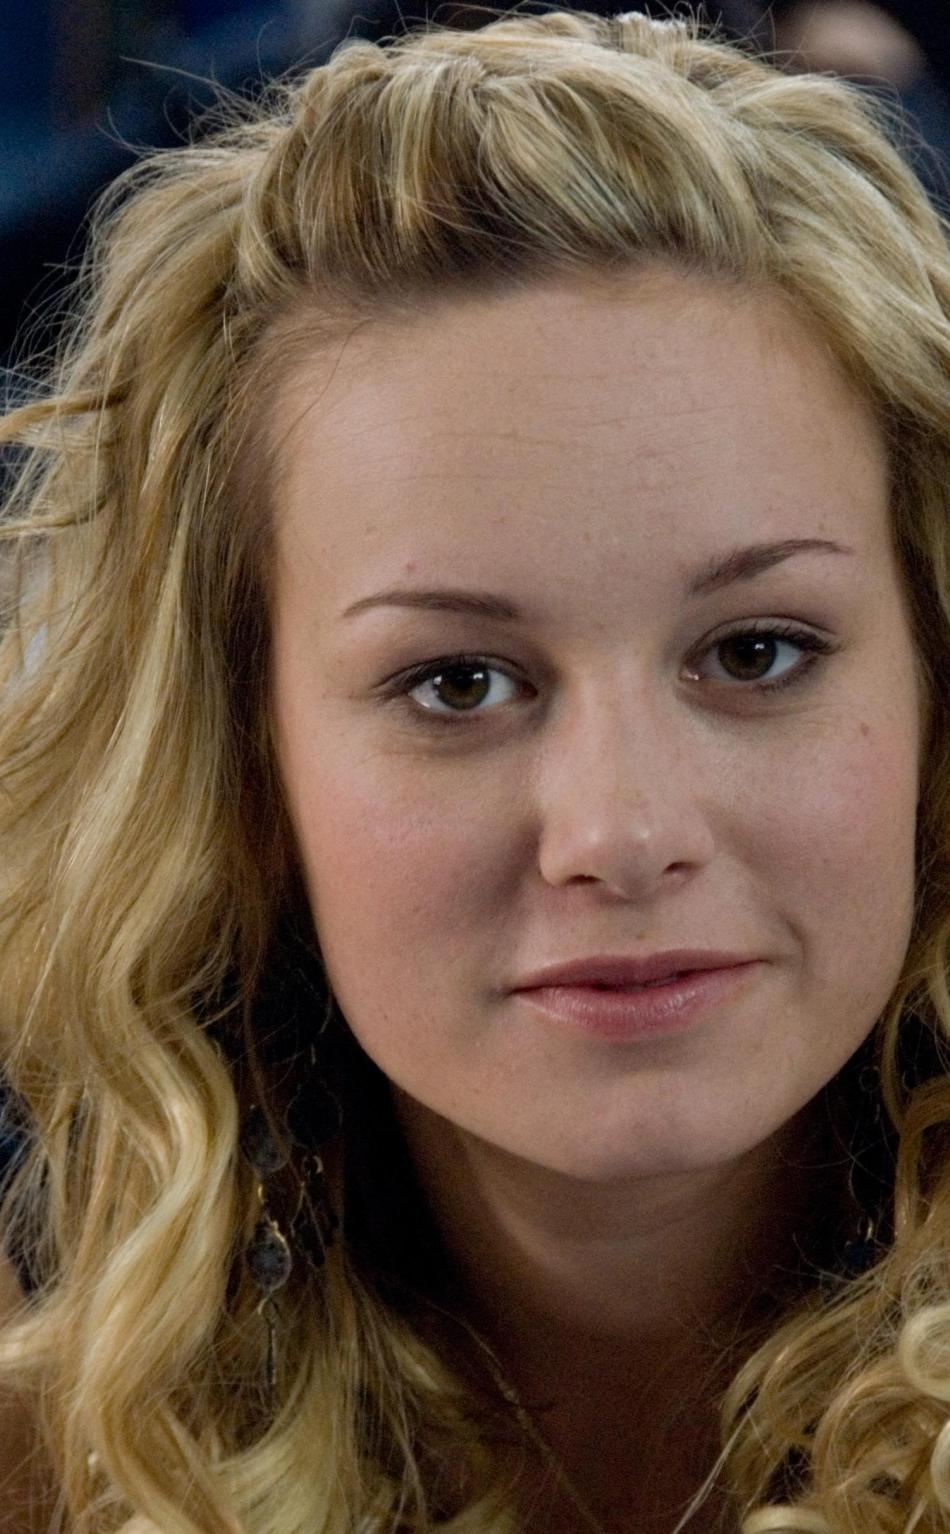 Brie Larson, Actress, Blonde, HD 4K Wallpaper